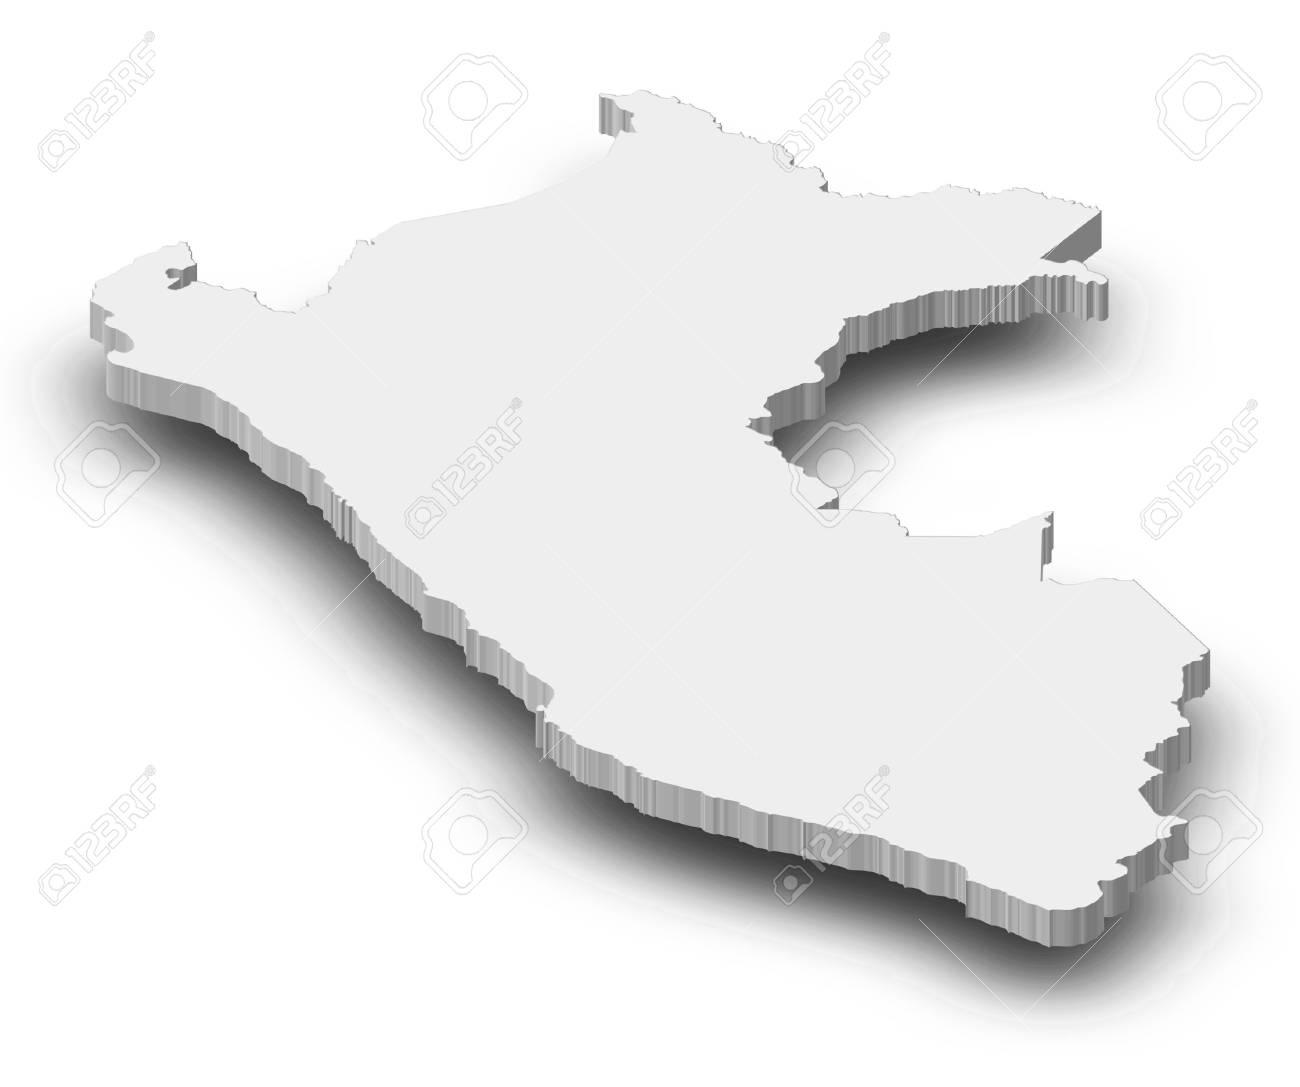 Peru Karte Umriss.Stock Photo